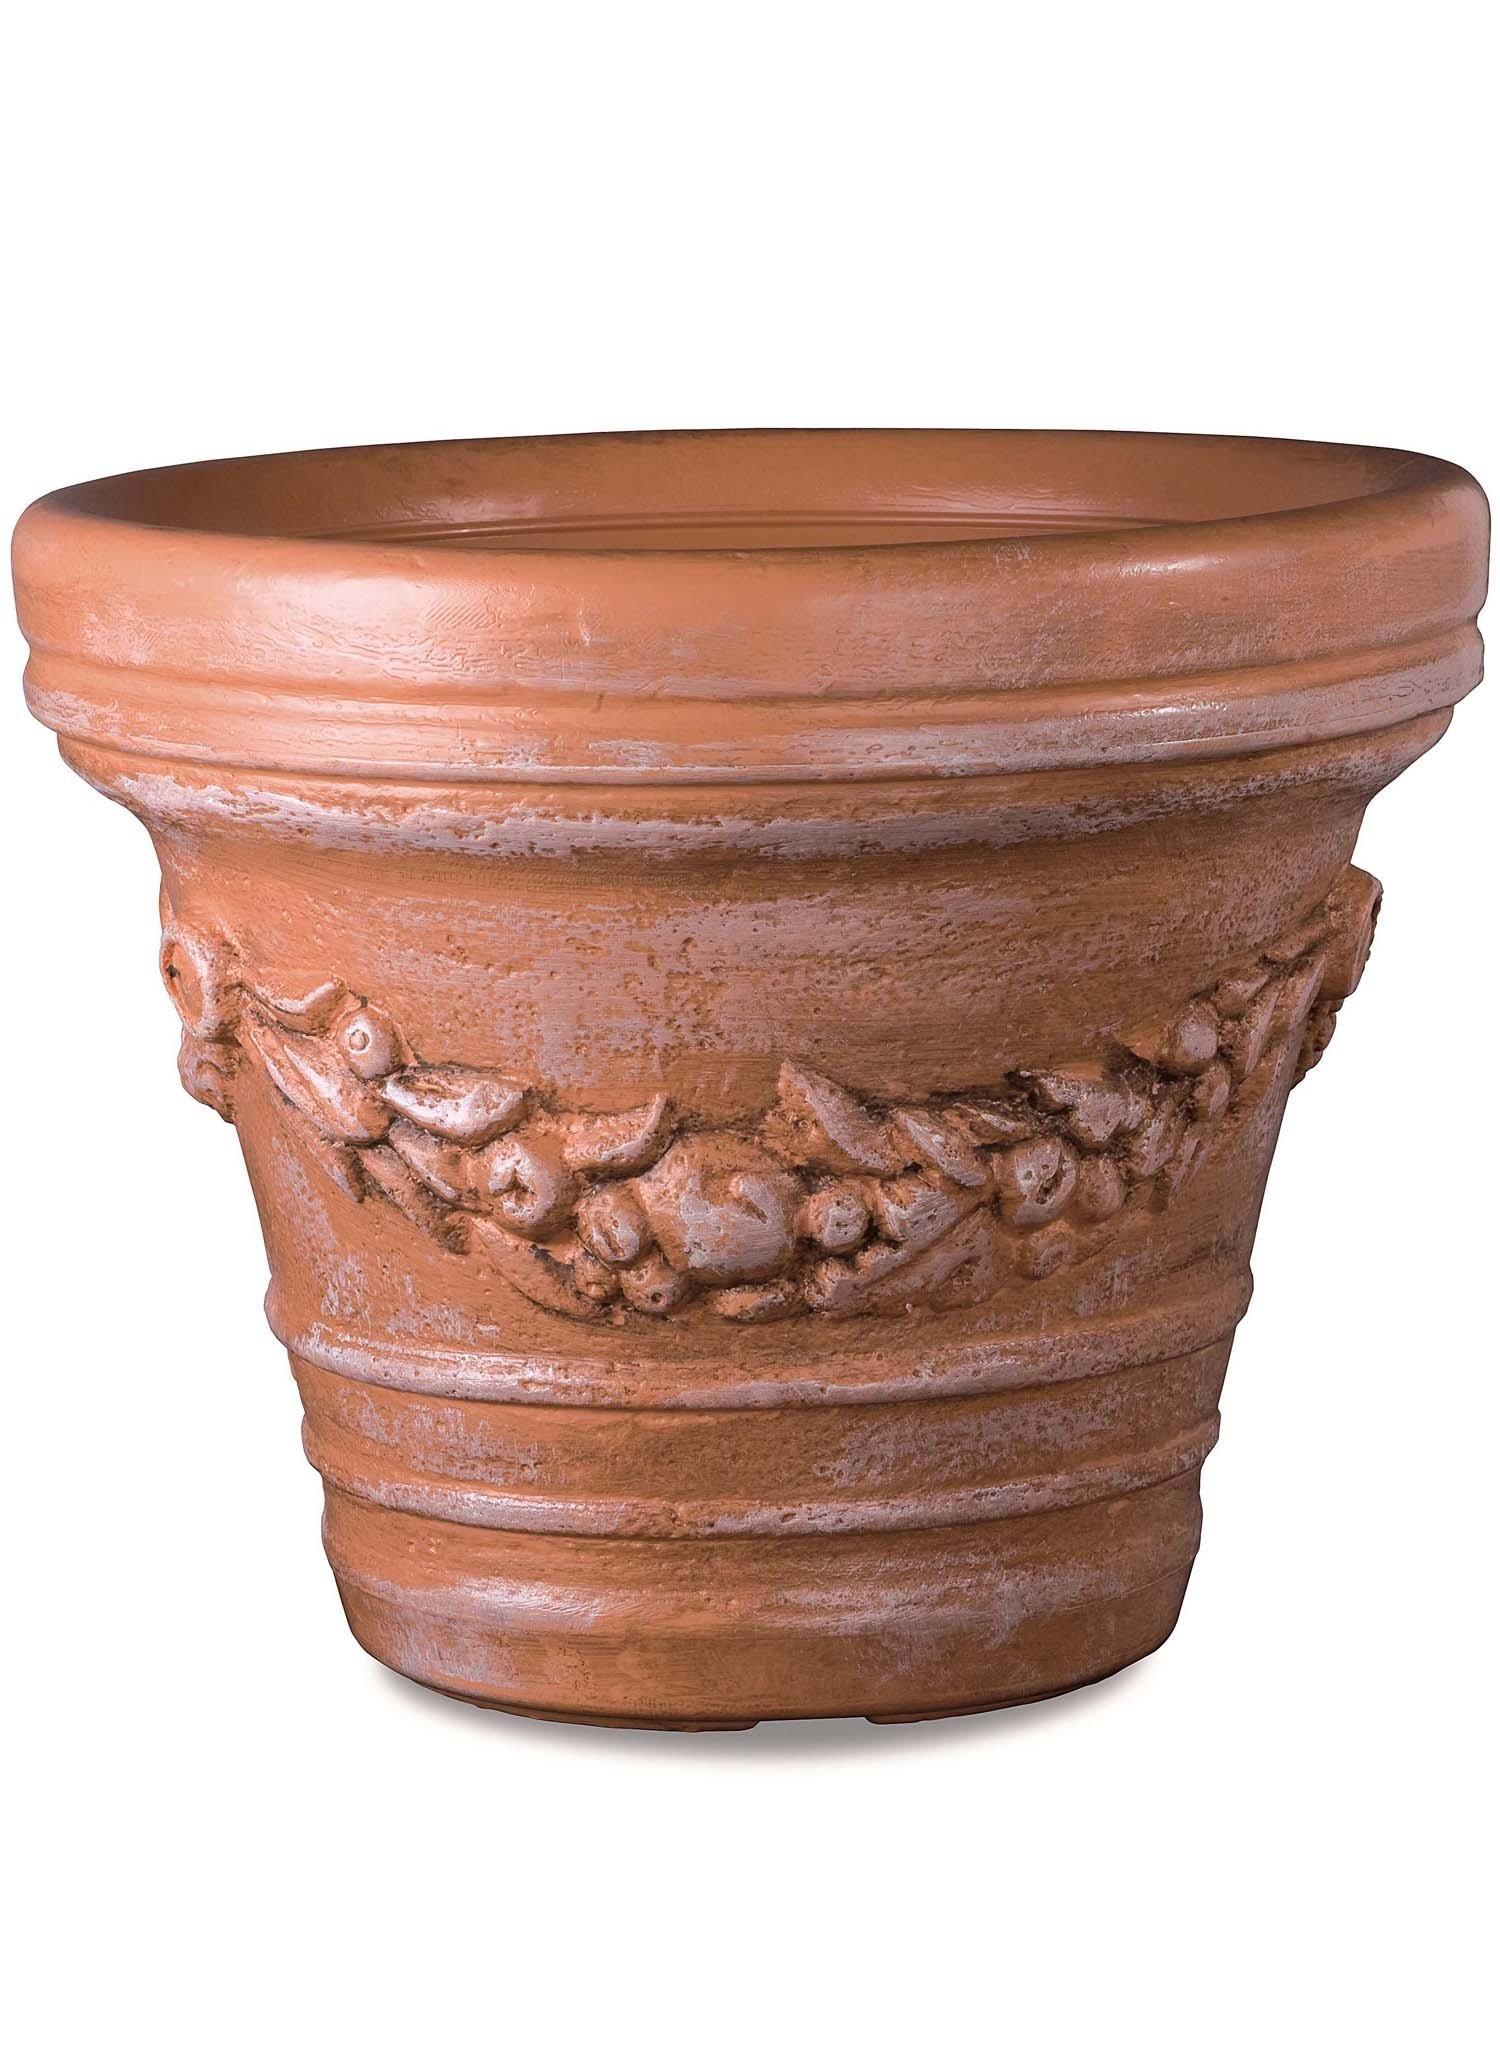 Blumen-Topf,antik 29cm - 2 - Ronja.ch